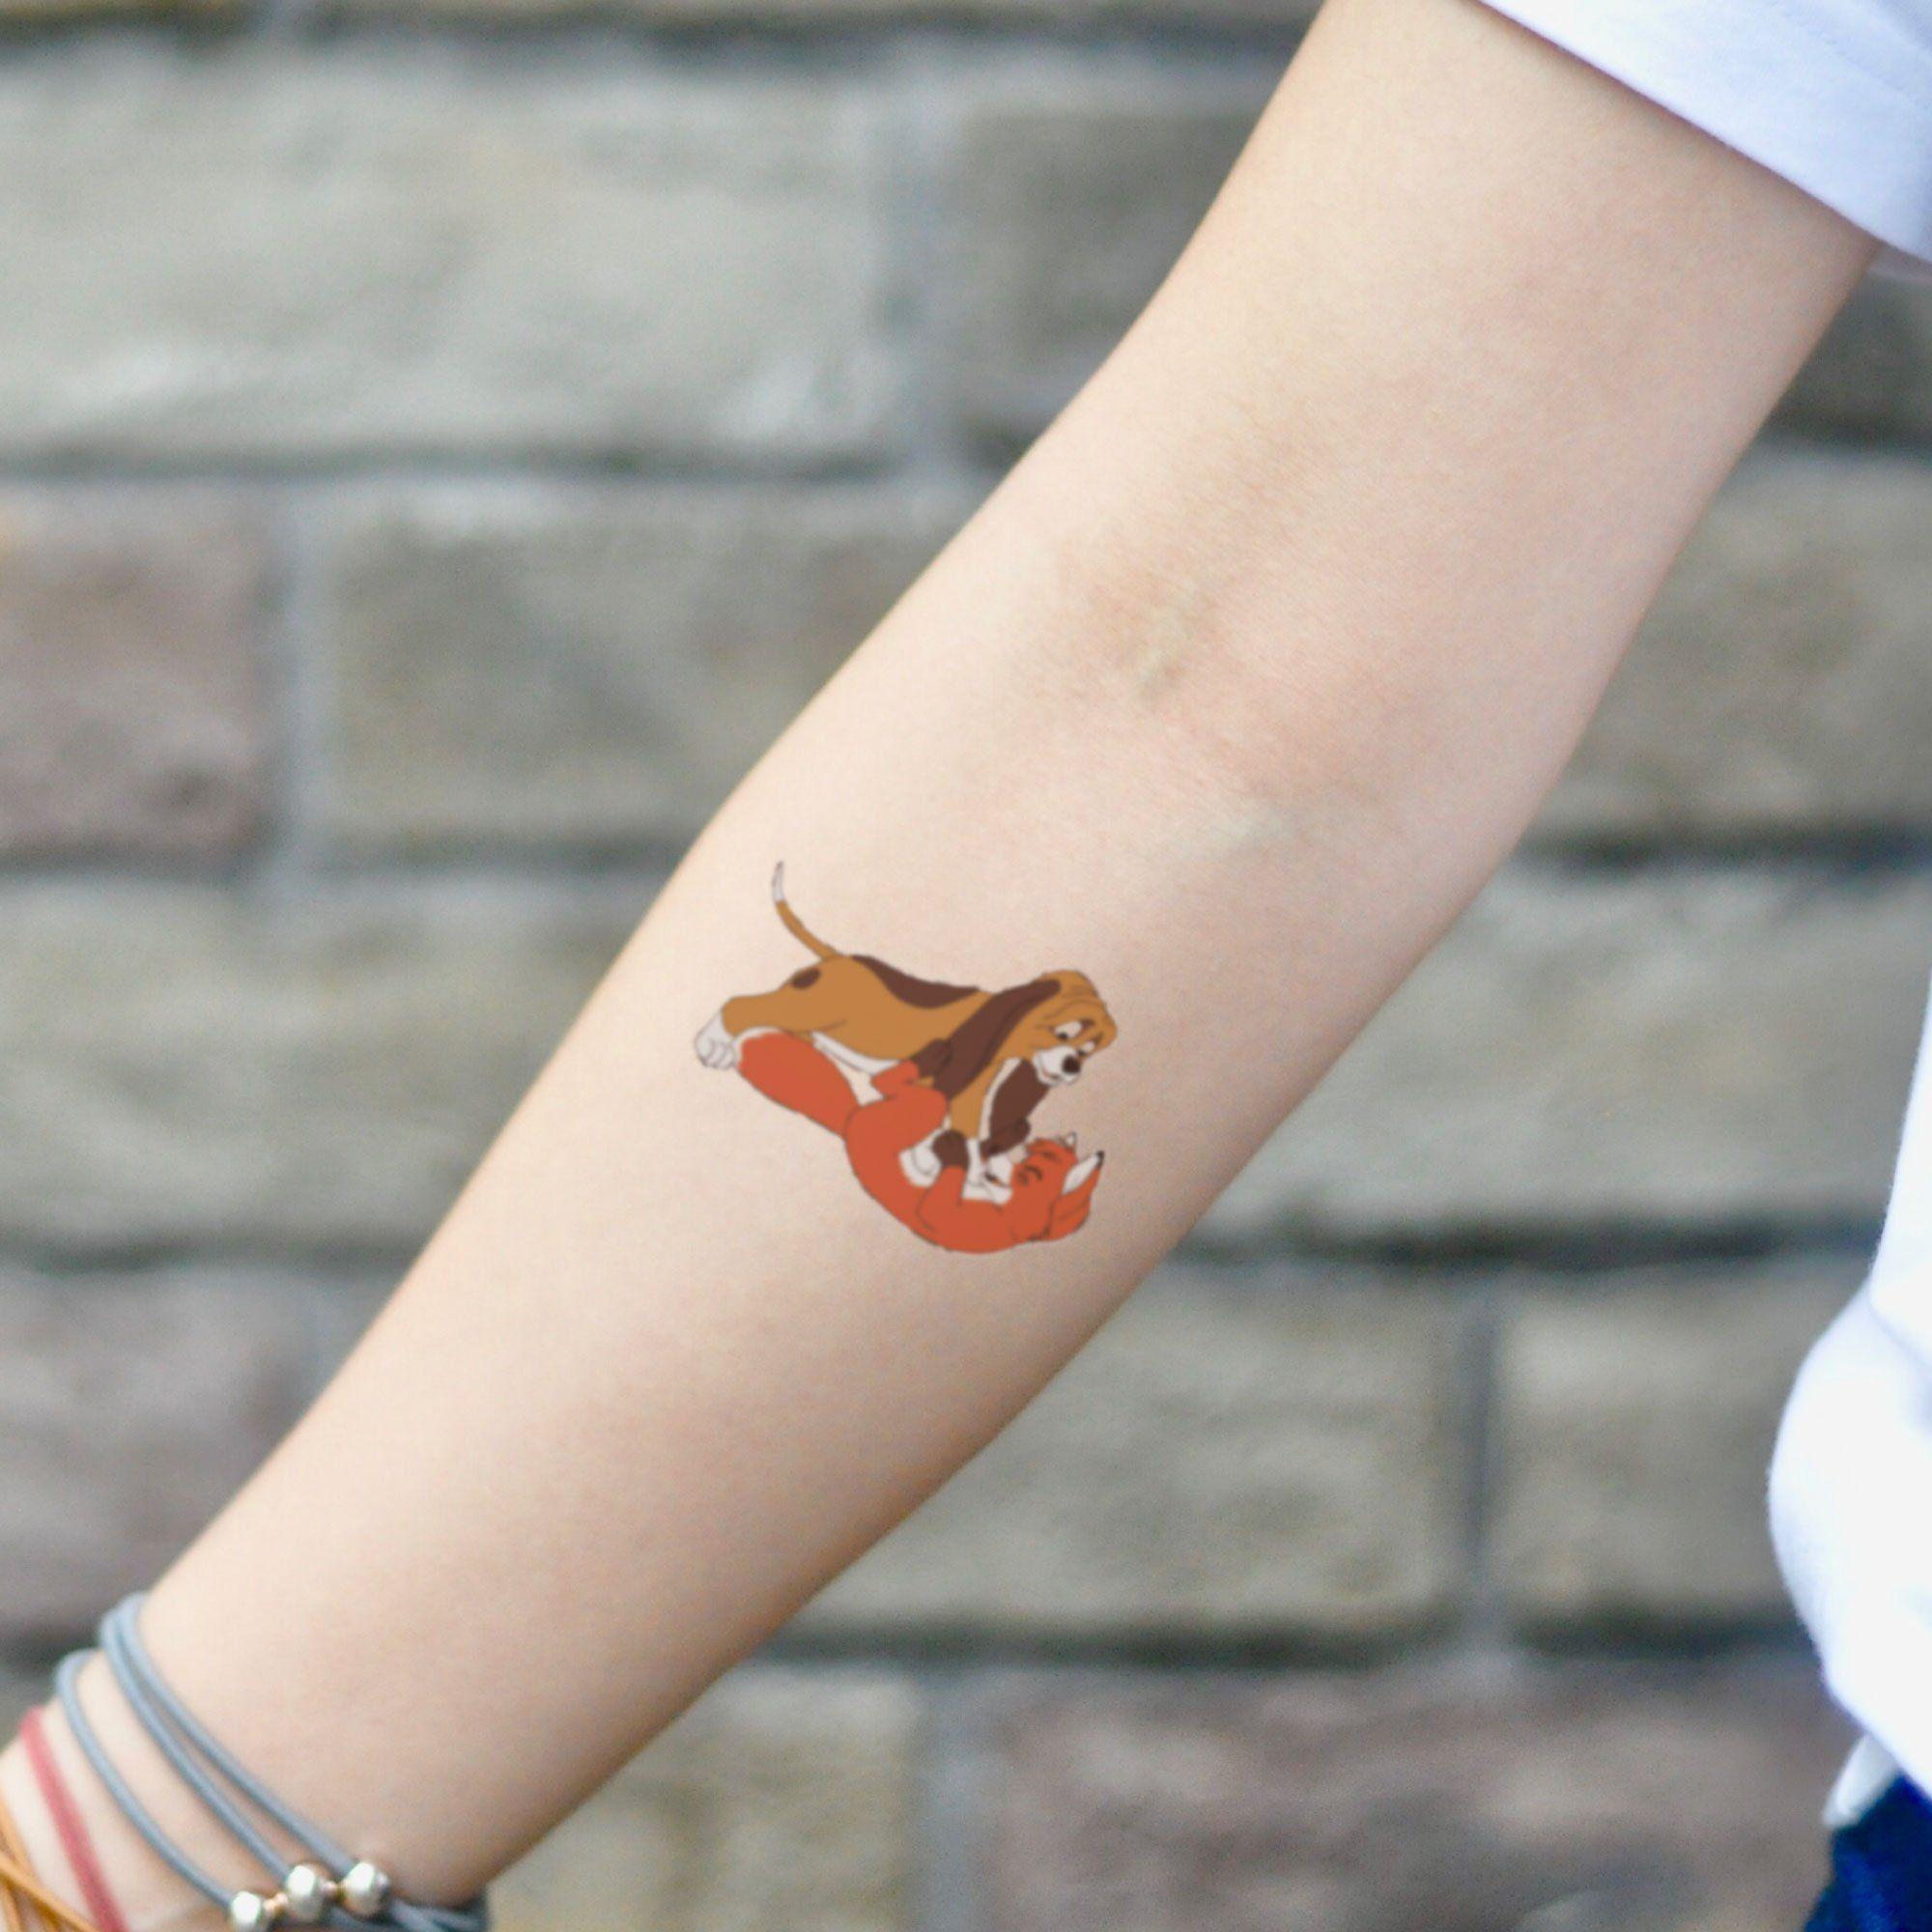 Fox And The Hound Temporary Tattoo Sticker Set Of 2 In 2020 Fox Tattoo Grey Tattoo Black And Grey Tattoos